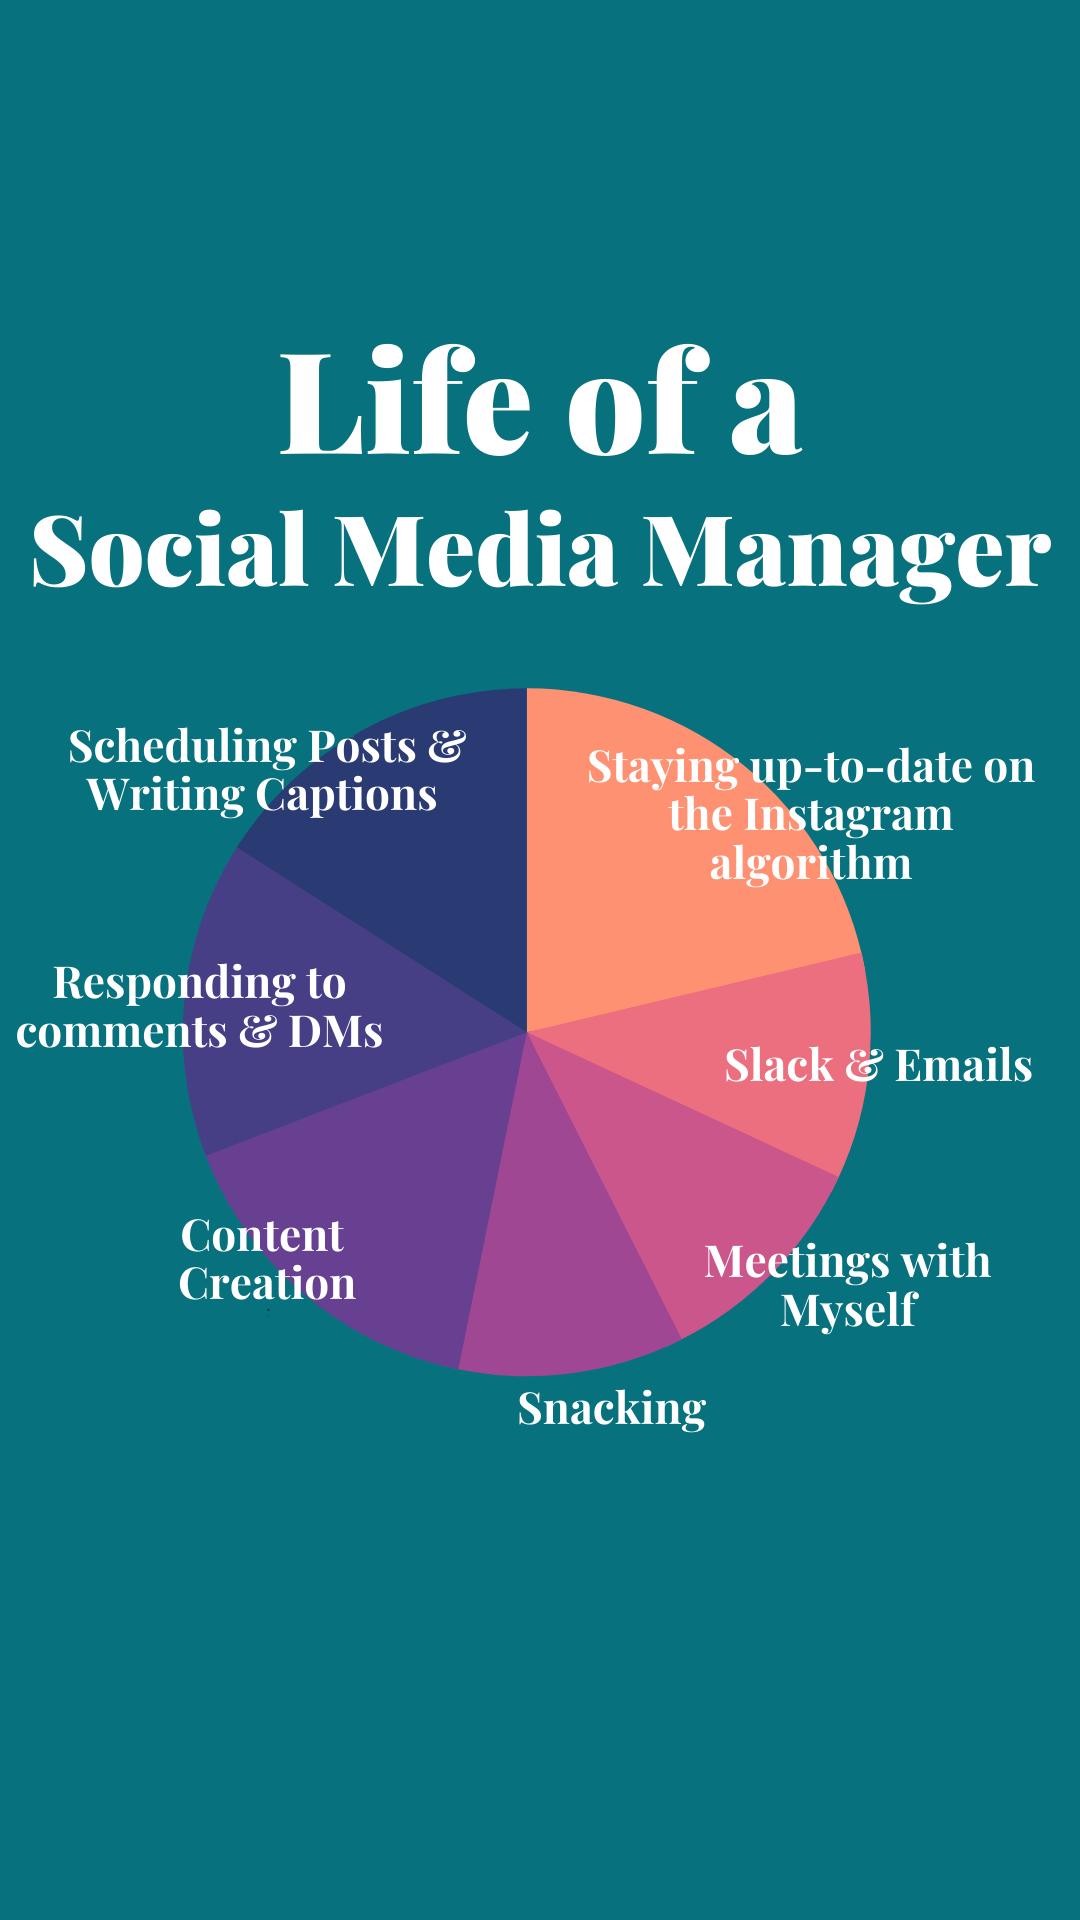 Life Of A Social Media Manager Social Studio Co Social Media Content Strategy Social Media Strategy Template Social Media Manager